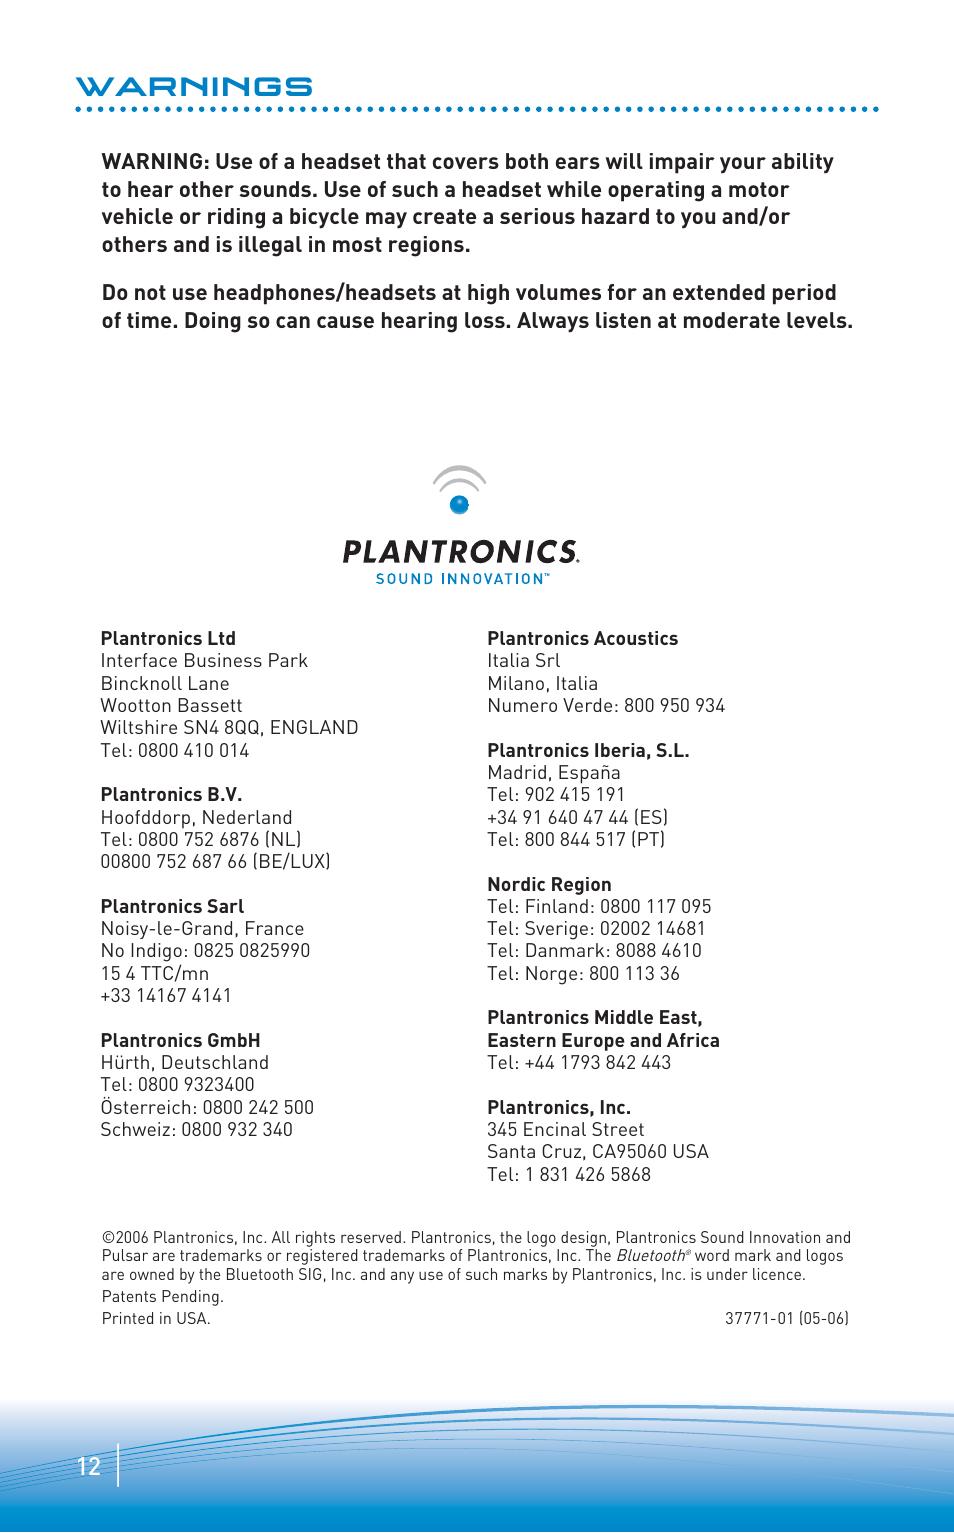 plantronics pulsar 260 stereo bluetooth headset user manual page 7 7 rh manualsdir com plantronics discovery 640 manual Plantronics BackBeat Fit Manual